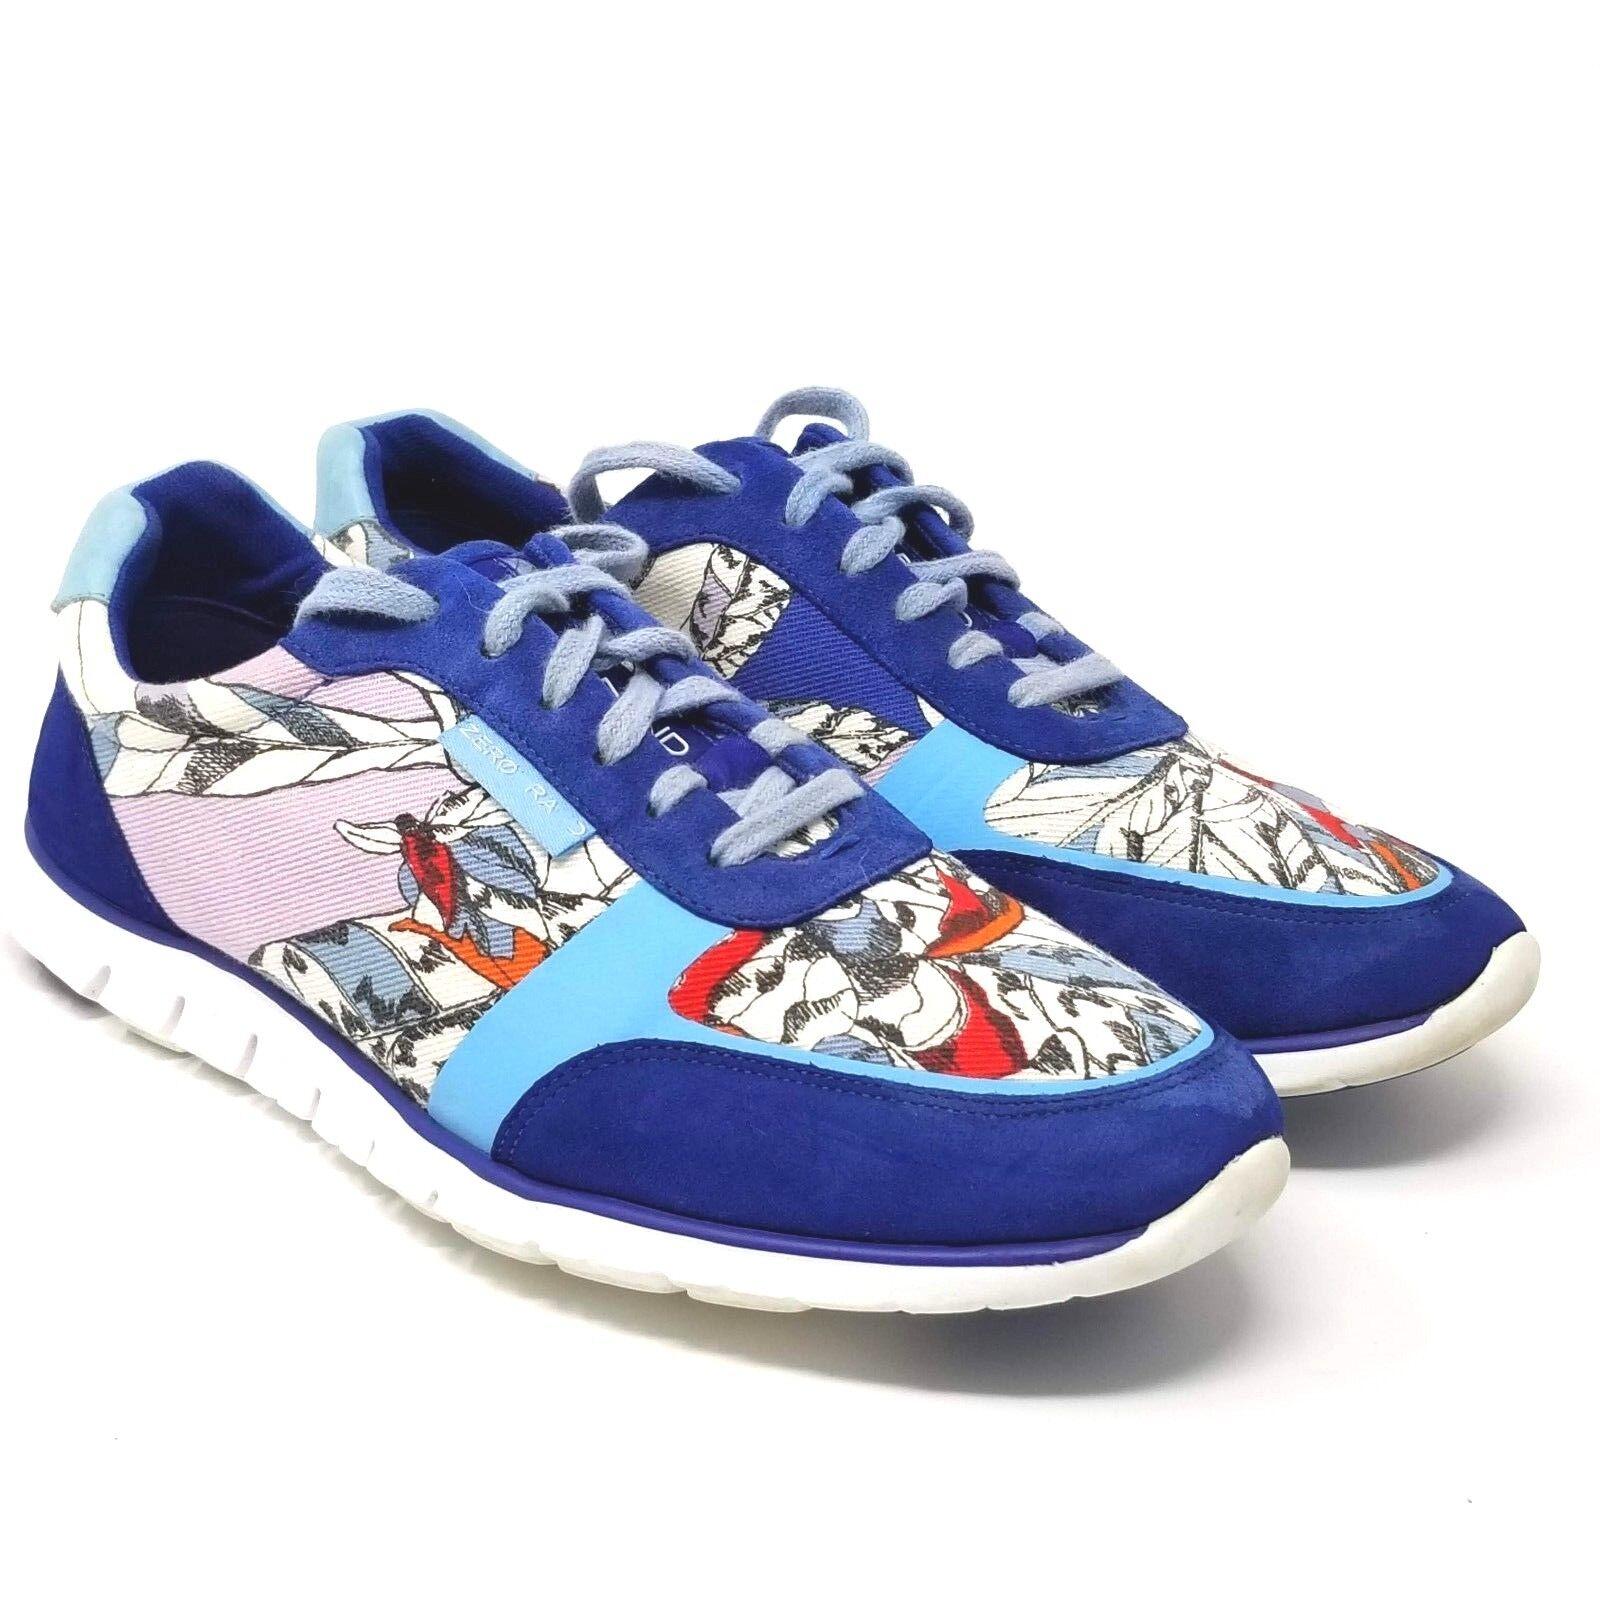 Cole Haan Womens bluee Zerogrand Classic Trainer Sneaker W01947 Floral Flower 7.5